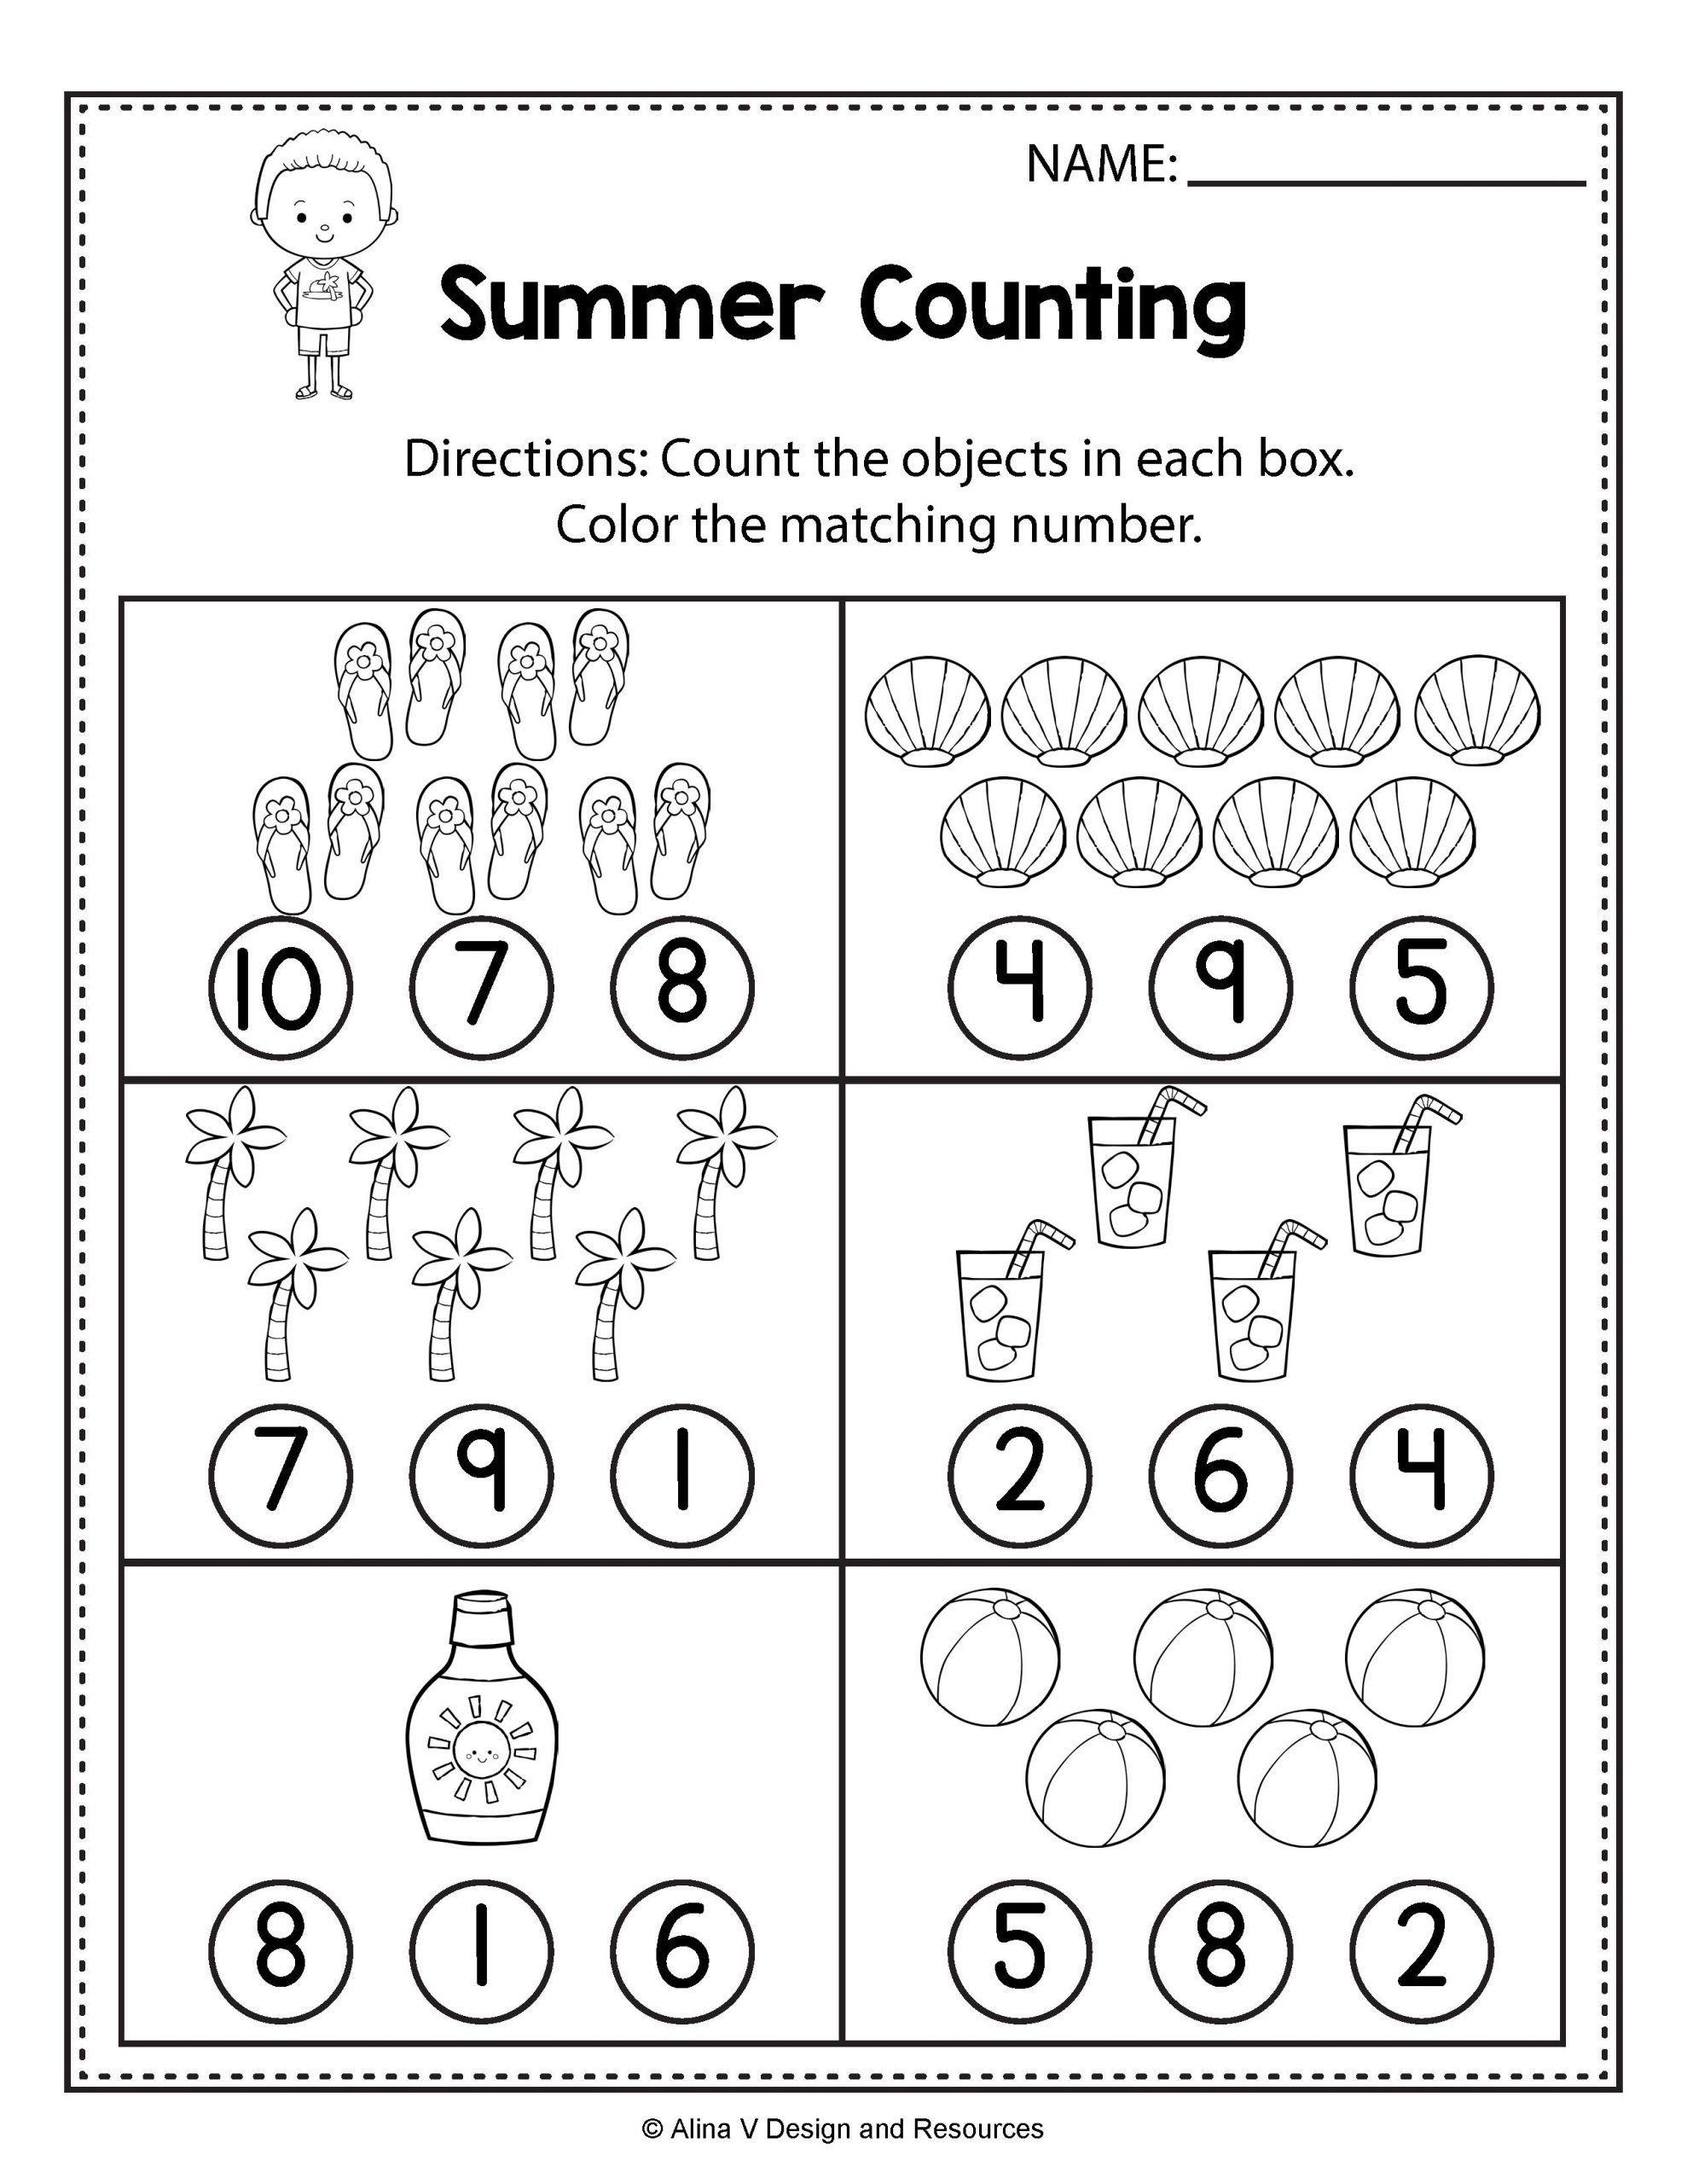 Counting Worksheets For Kindergarten Free Best Of Worksheets Math Worksheet Numbe In 2021 Summer Math Worksheets Kindergarten Math Worksheets Printable Math Worksheets Kindergarten counting worksheets free